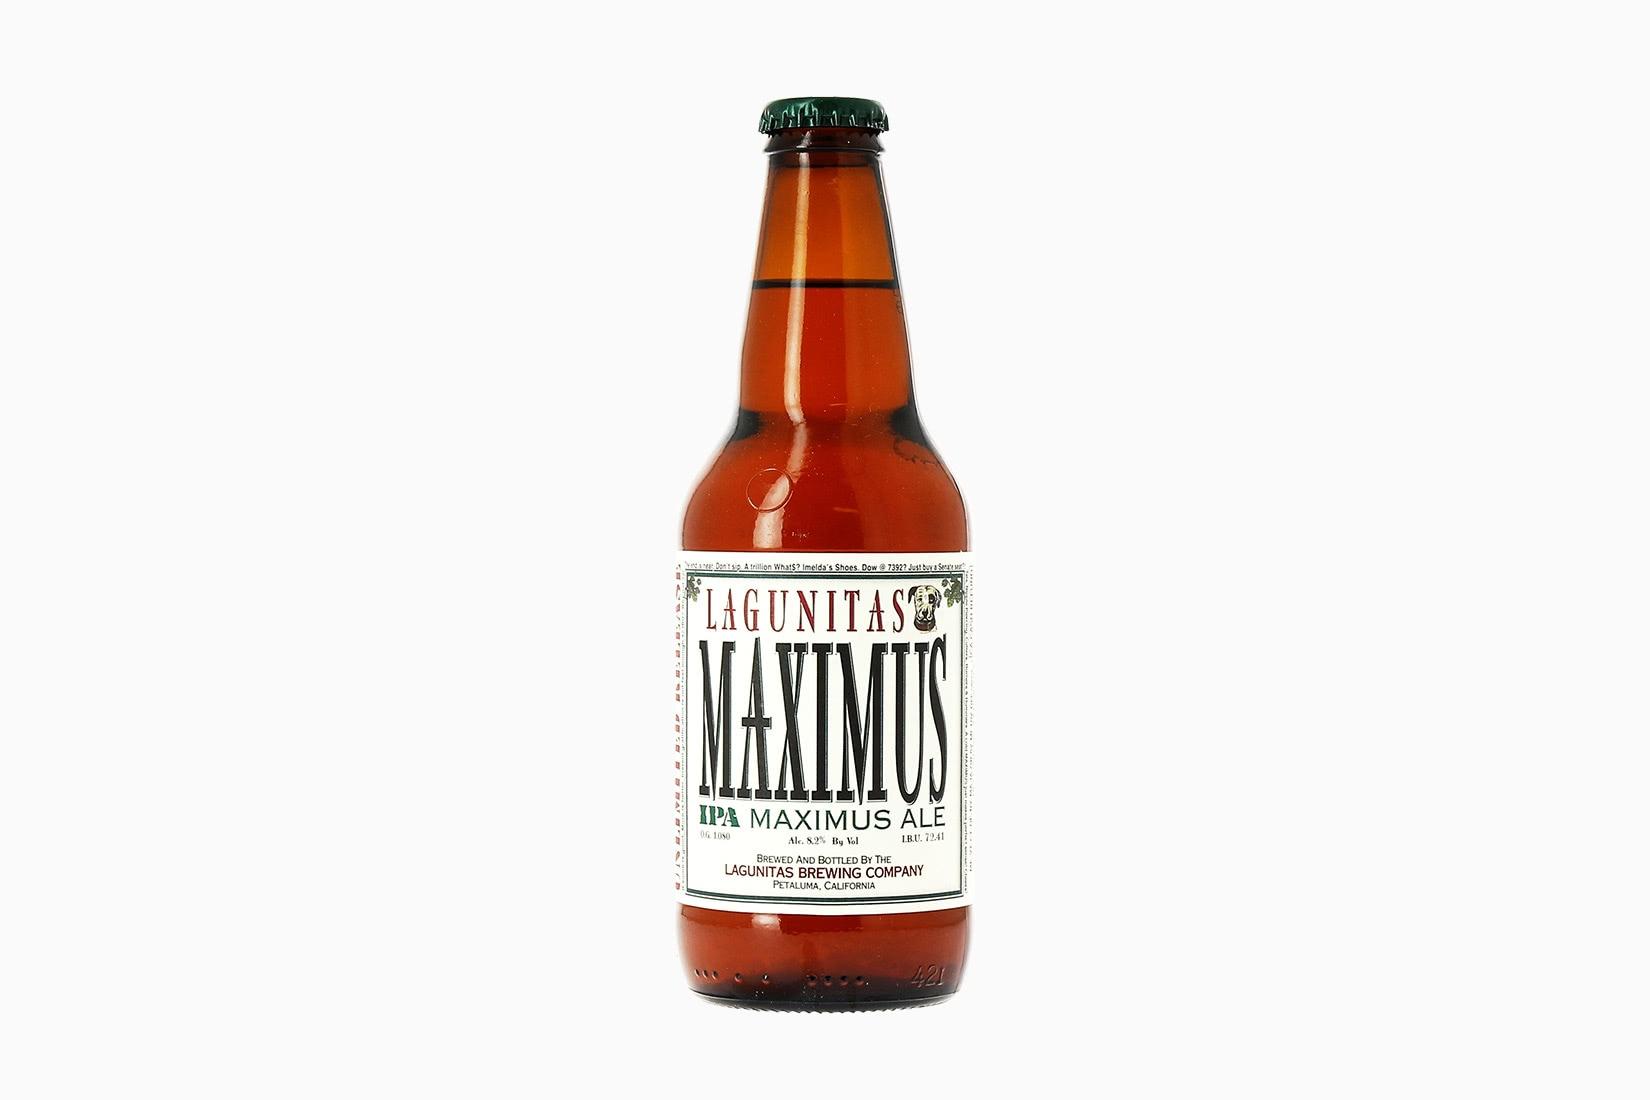 best beer brands lagunitas maximus ipa - Luxe Digital